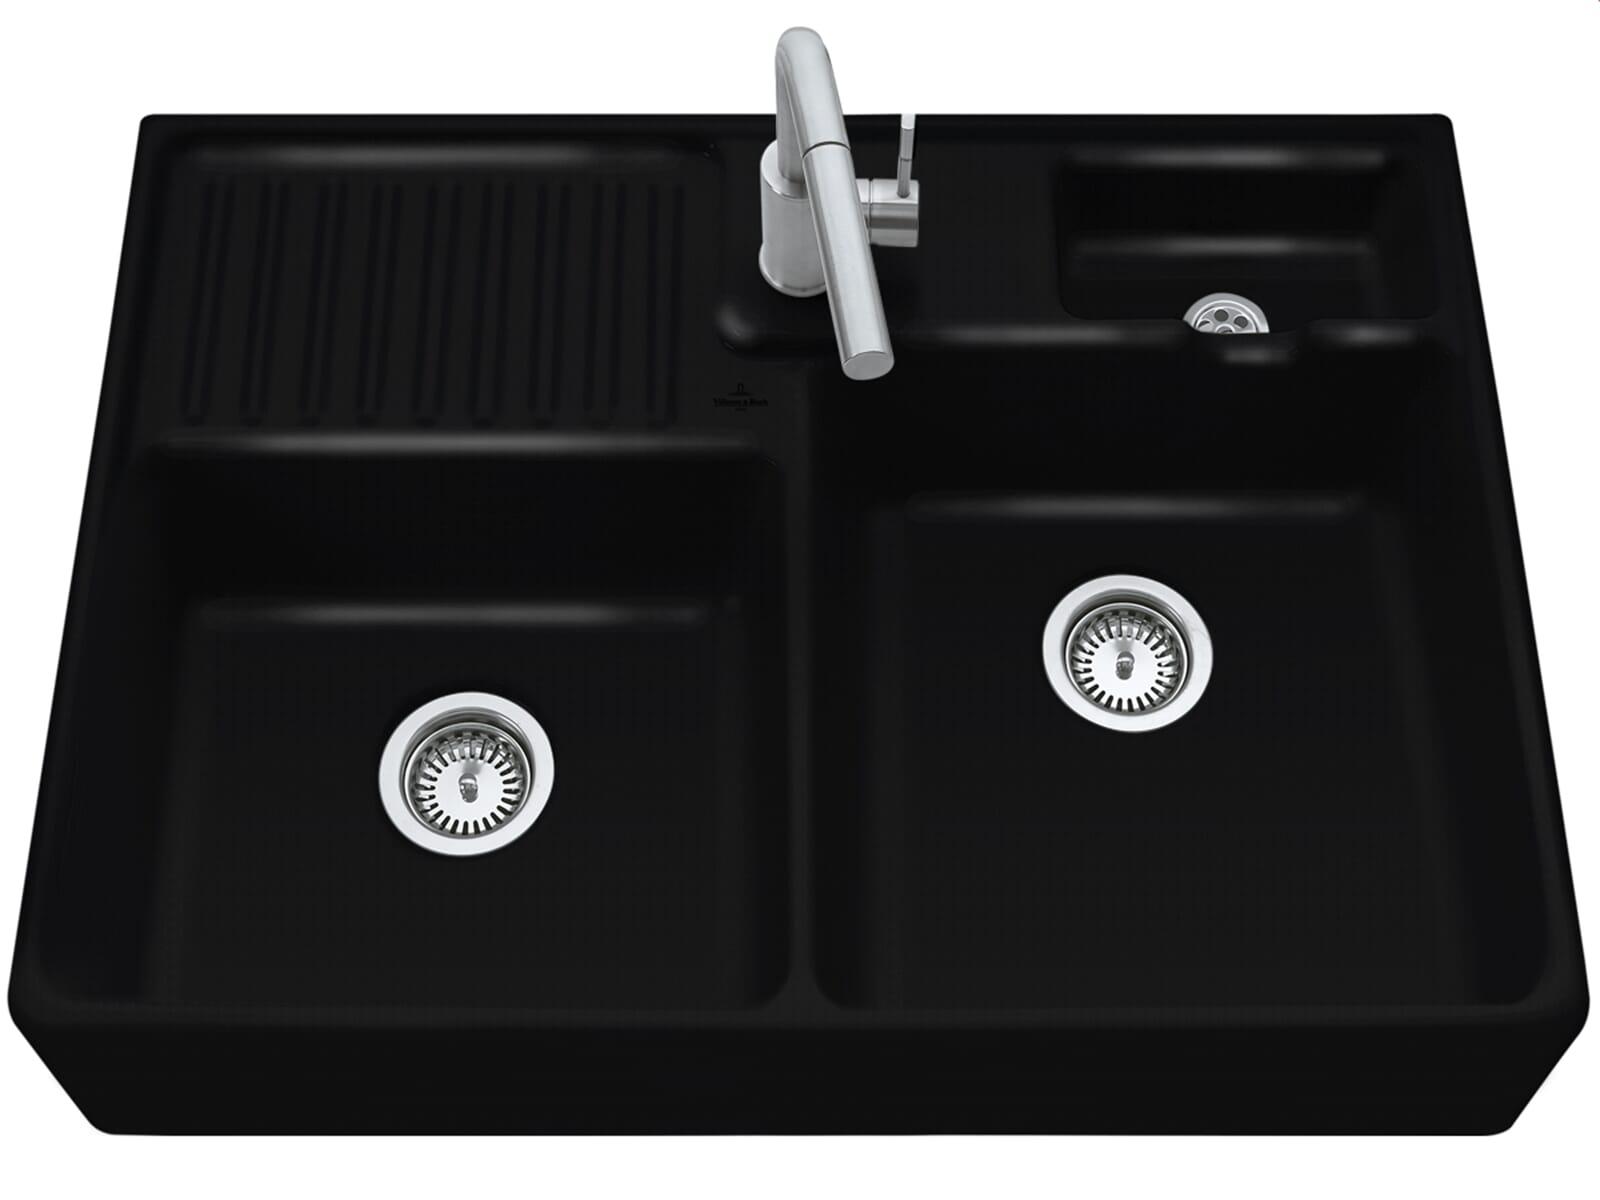 villeroy boch sp lstein doppelbecken chromit 6323 91 j0 keramiksp le. Black Bedroom Furniture Sets. Home Design Ideas